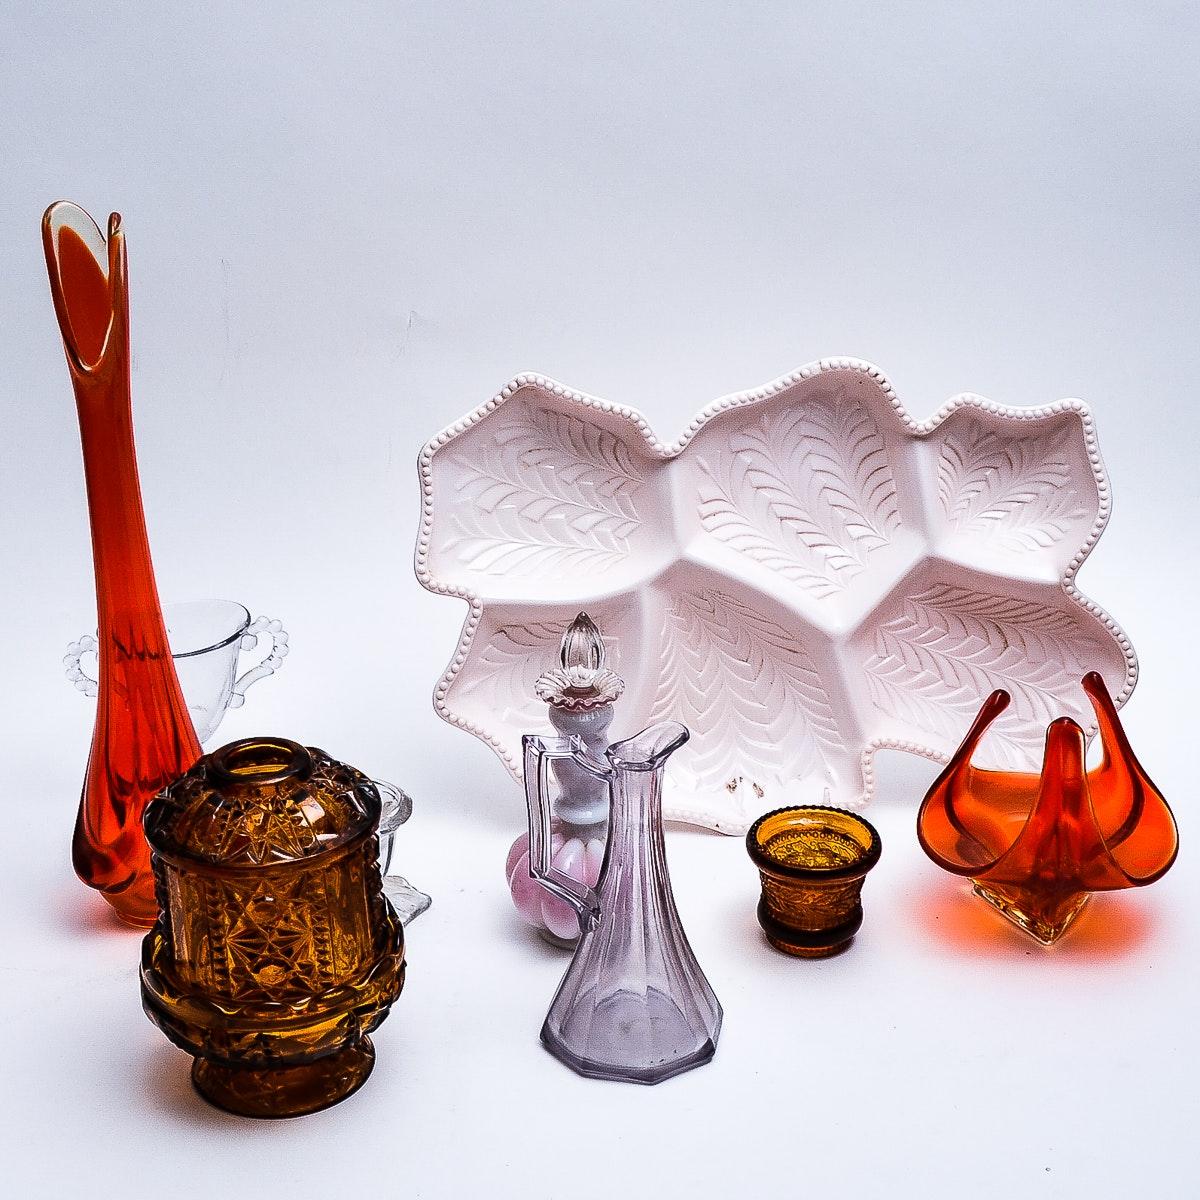 Collection of Vintage Glassware including Fenton